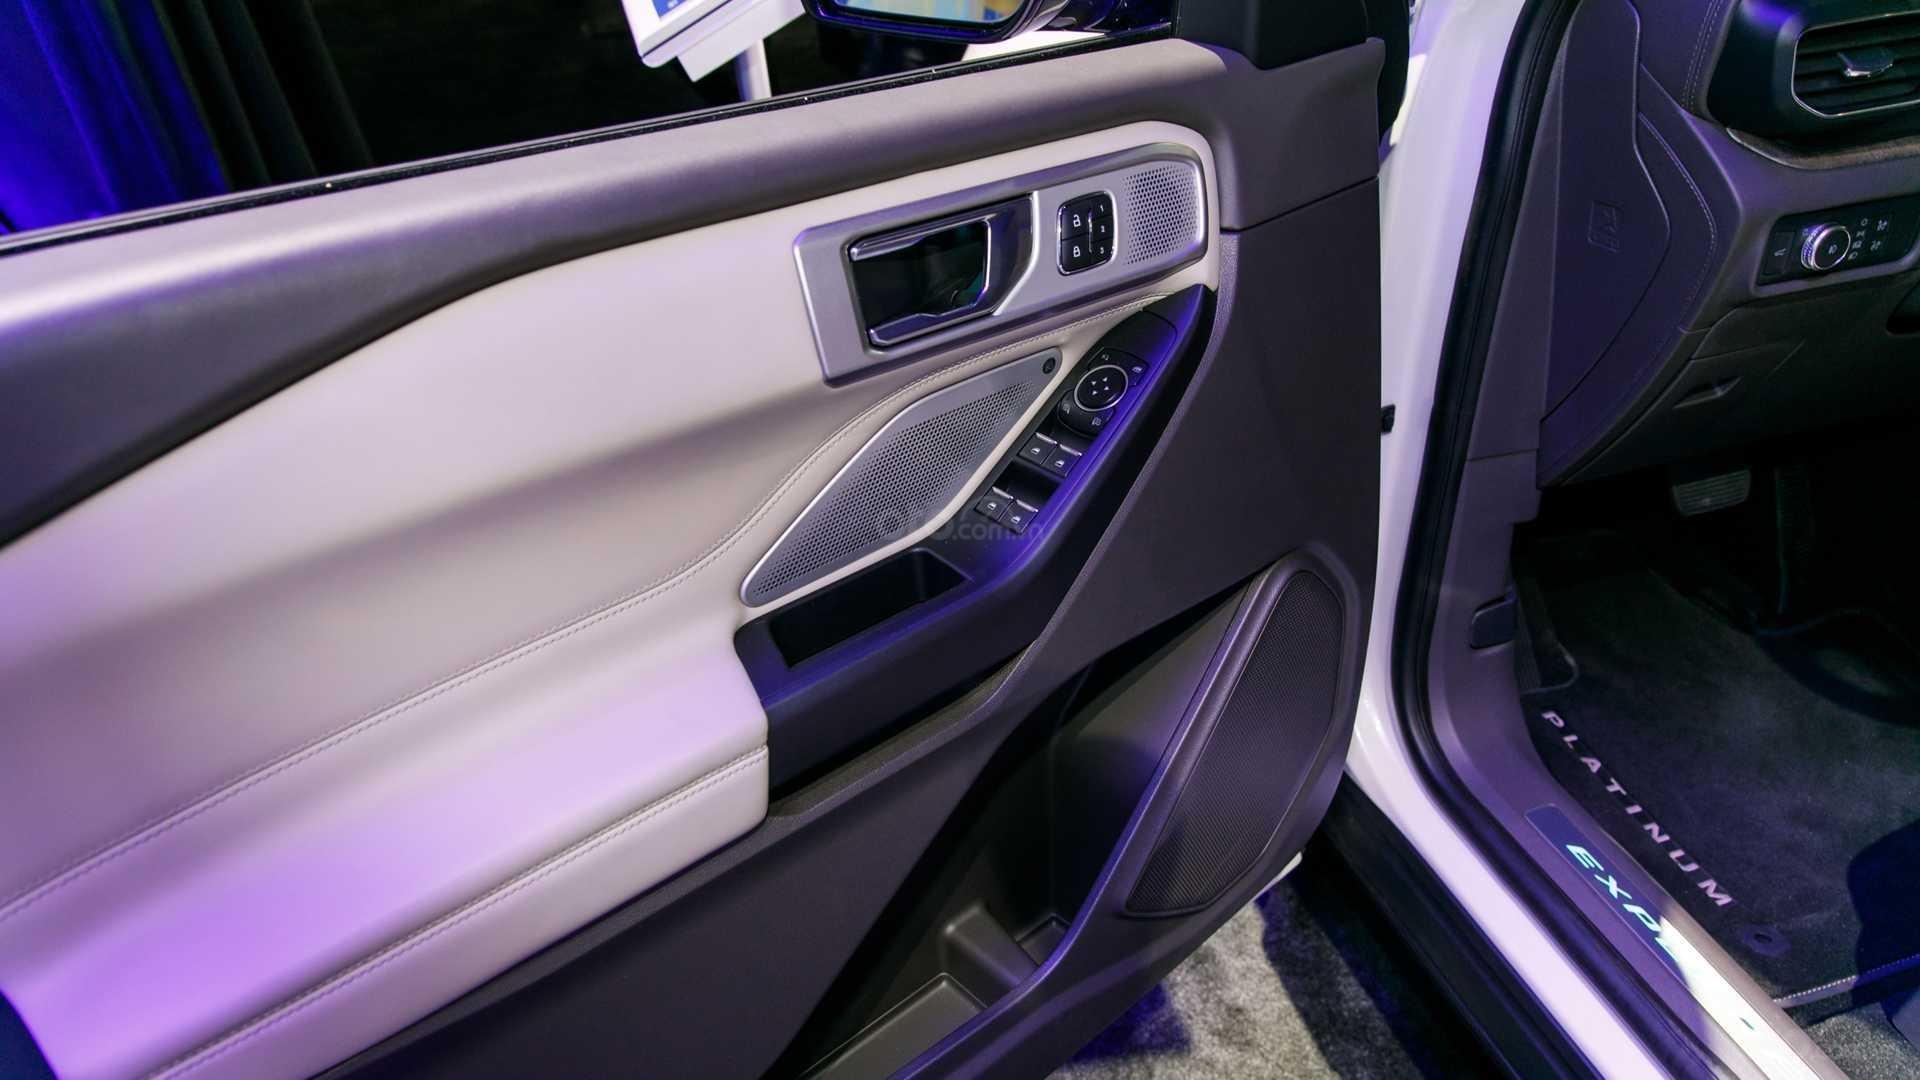 Cửa xe Ford Explorer 2020